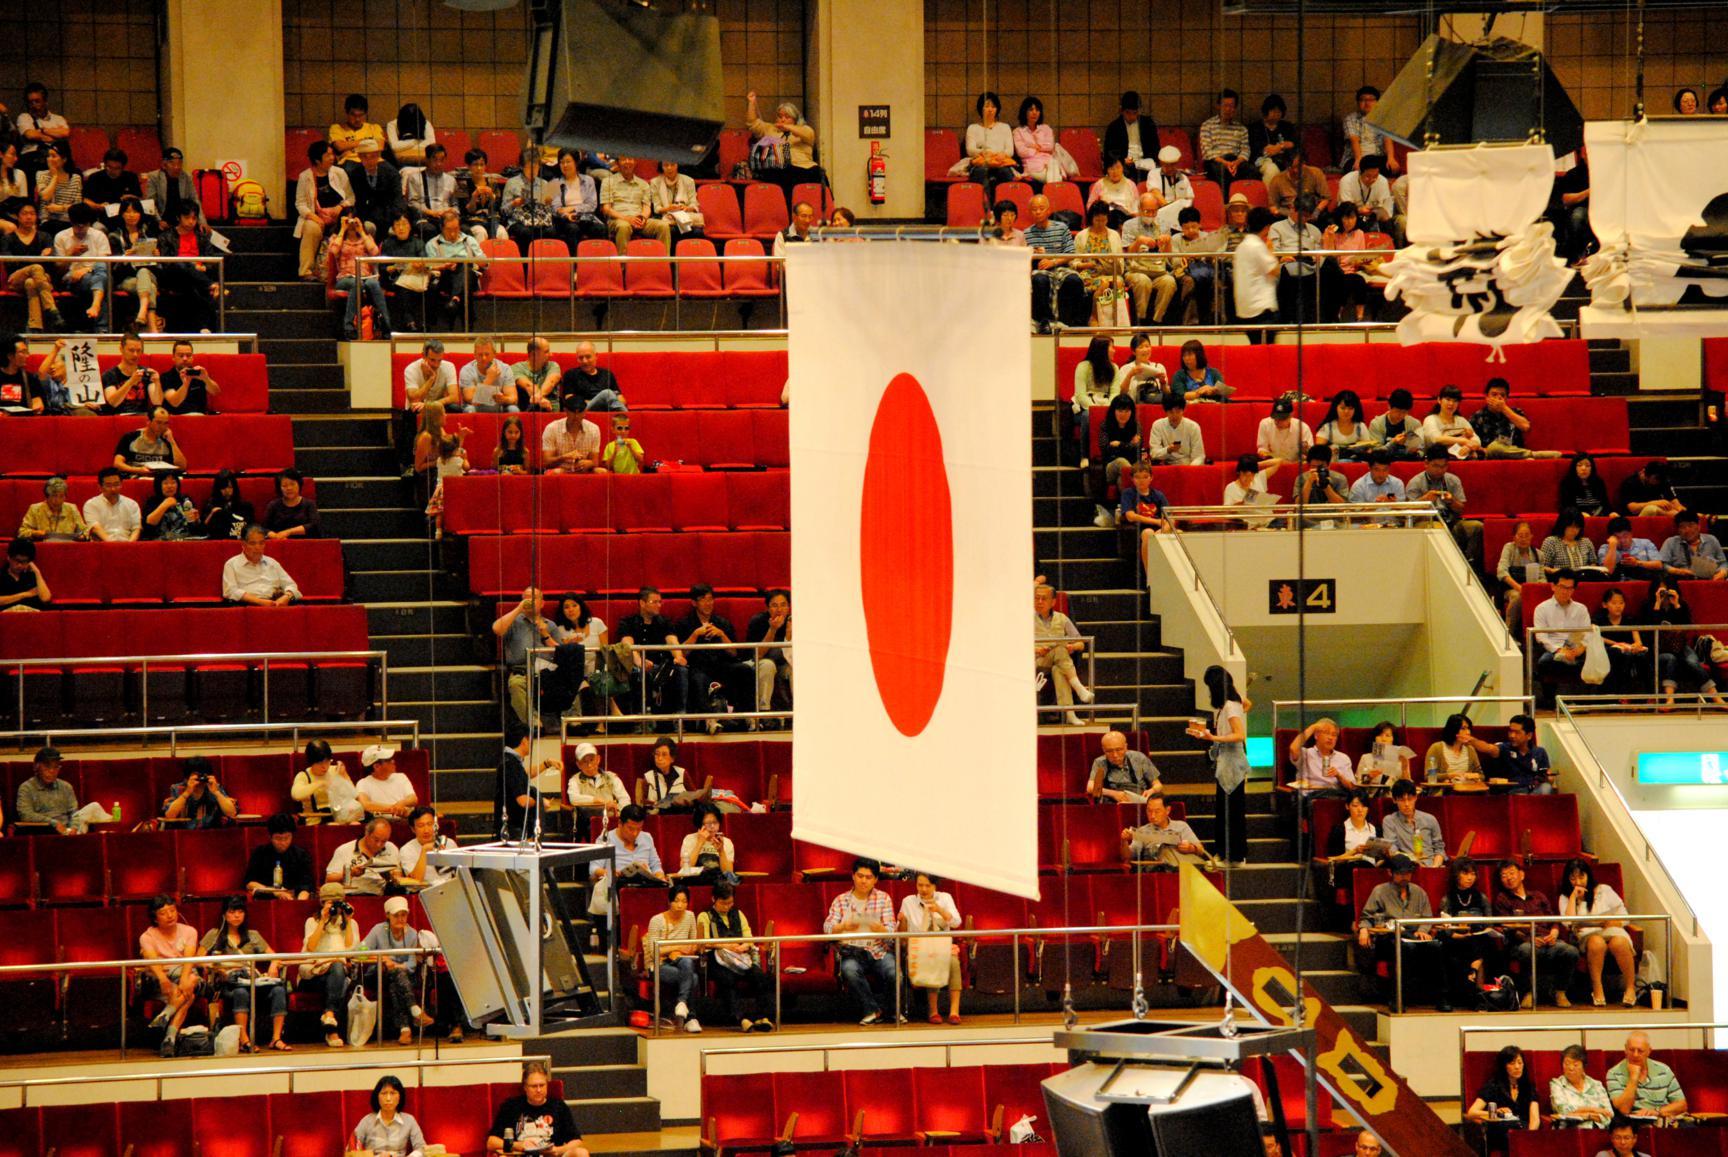 ryogoku-sumo